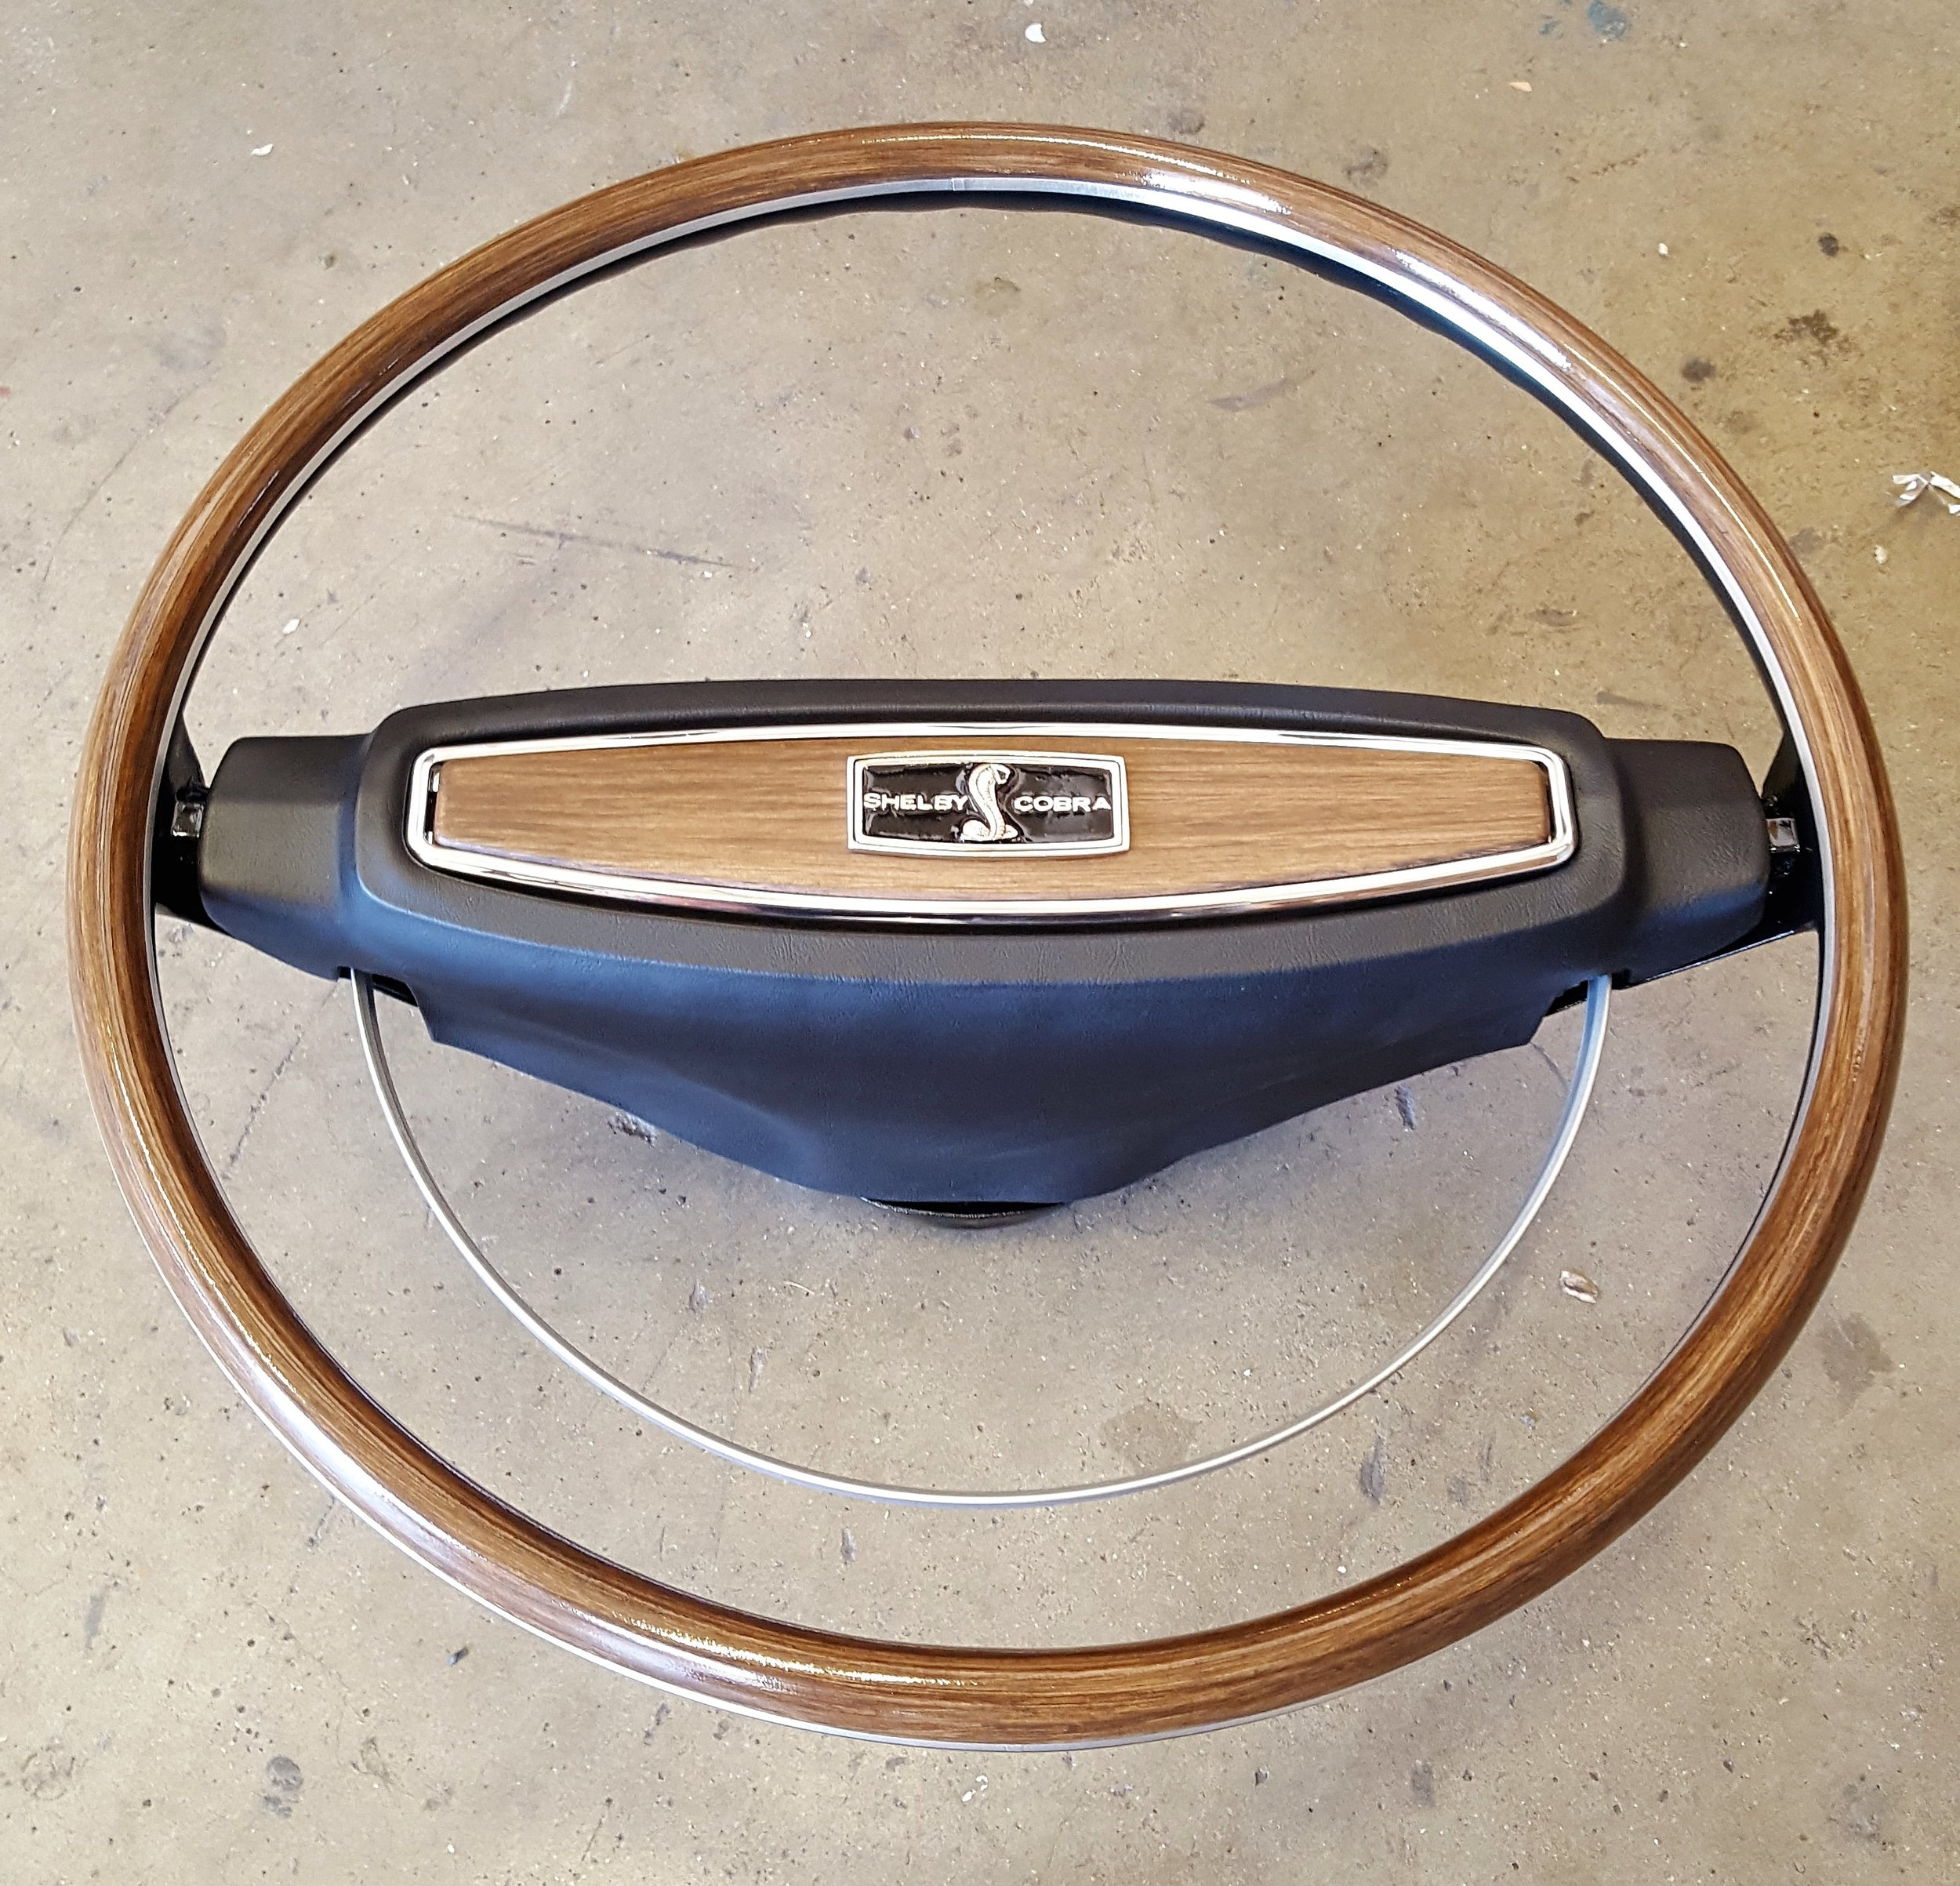 1968 Shelby deluxe steering wheel